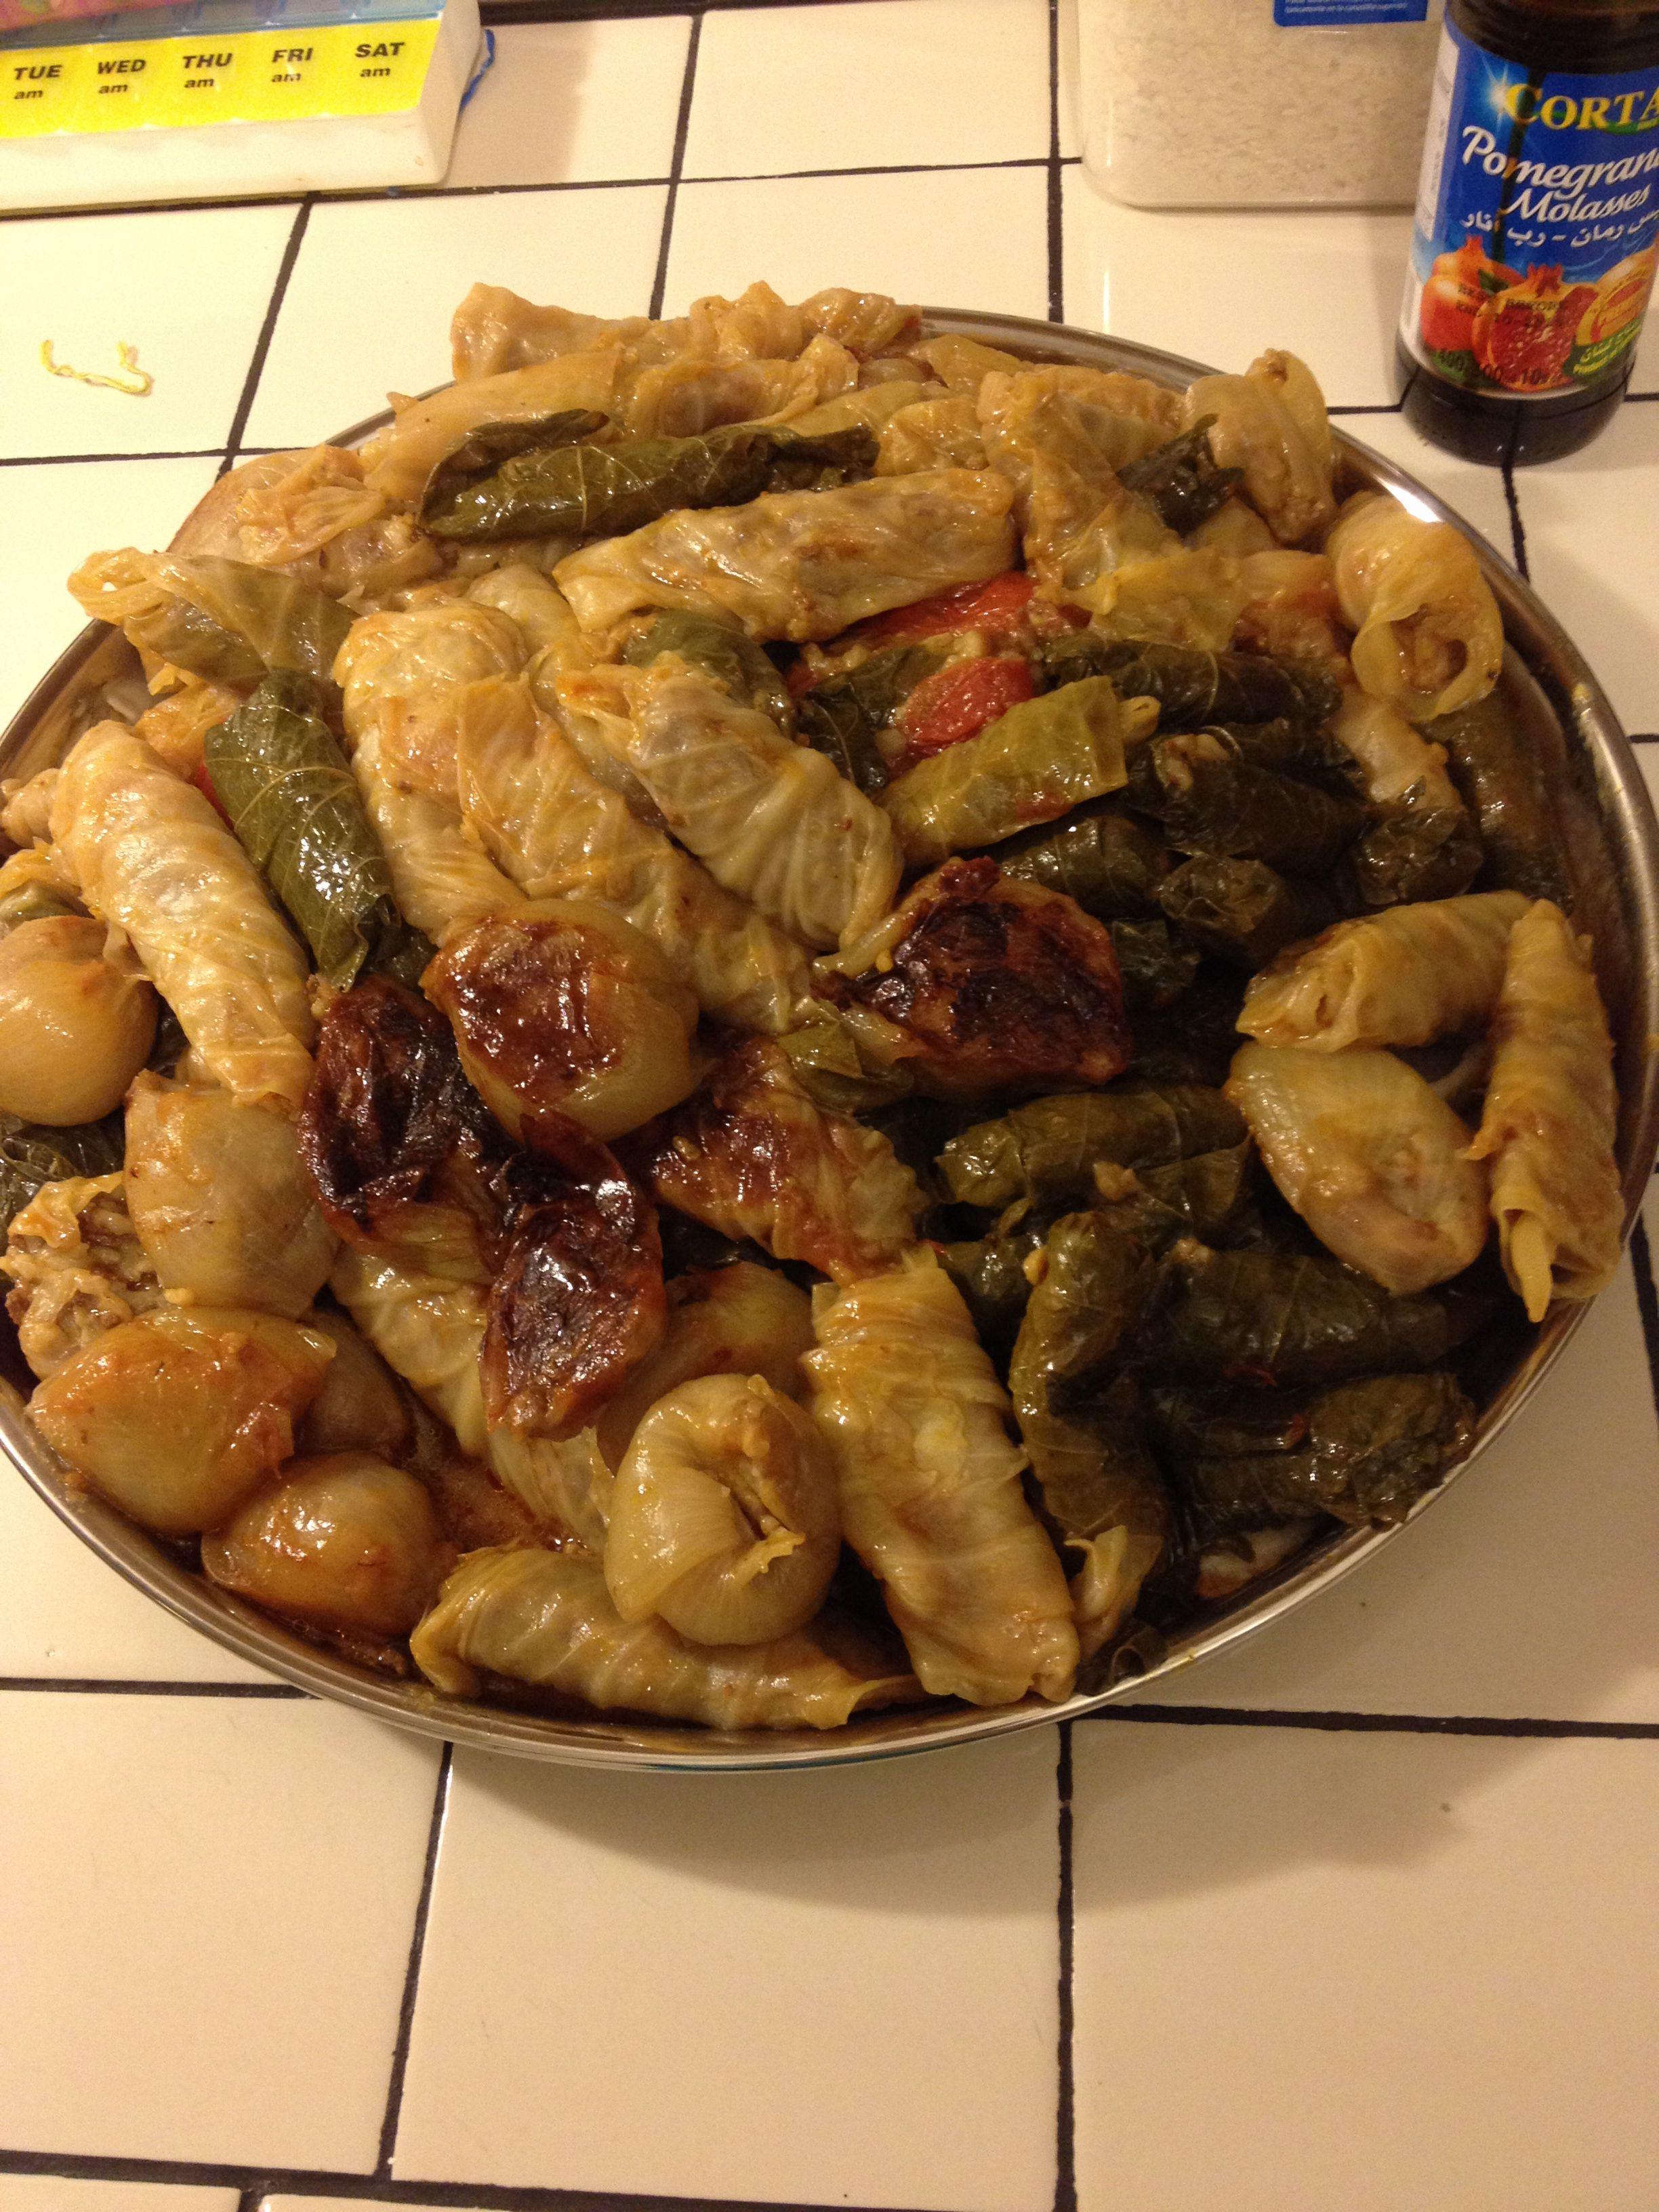 Iraqi Dolma One Of The Yummiest Things On Earth Preparation Time Consuming But Worth It Kurdish Food Iraqi Cuisine Iraqi Dolma Recipe